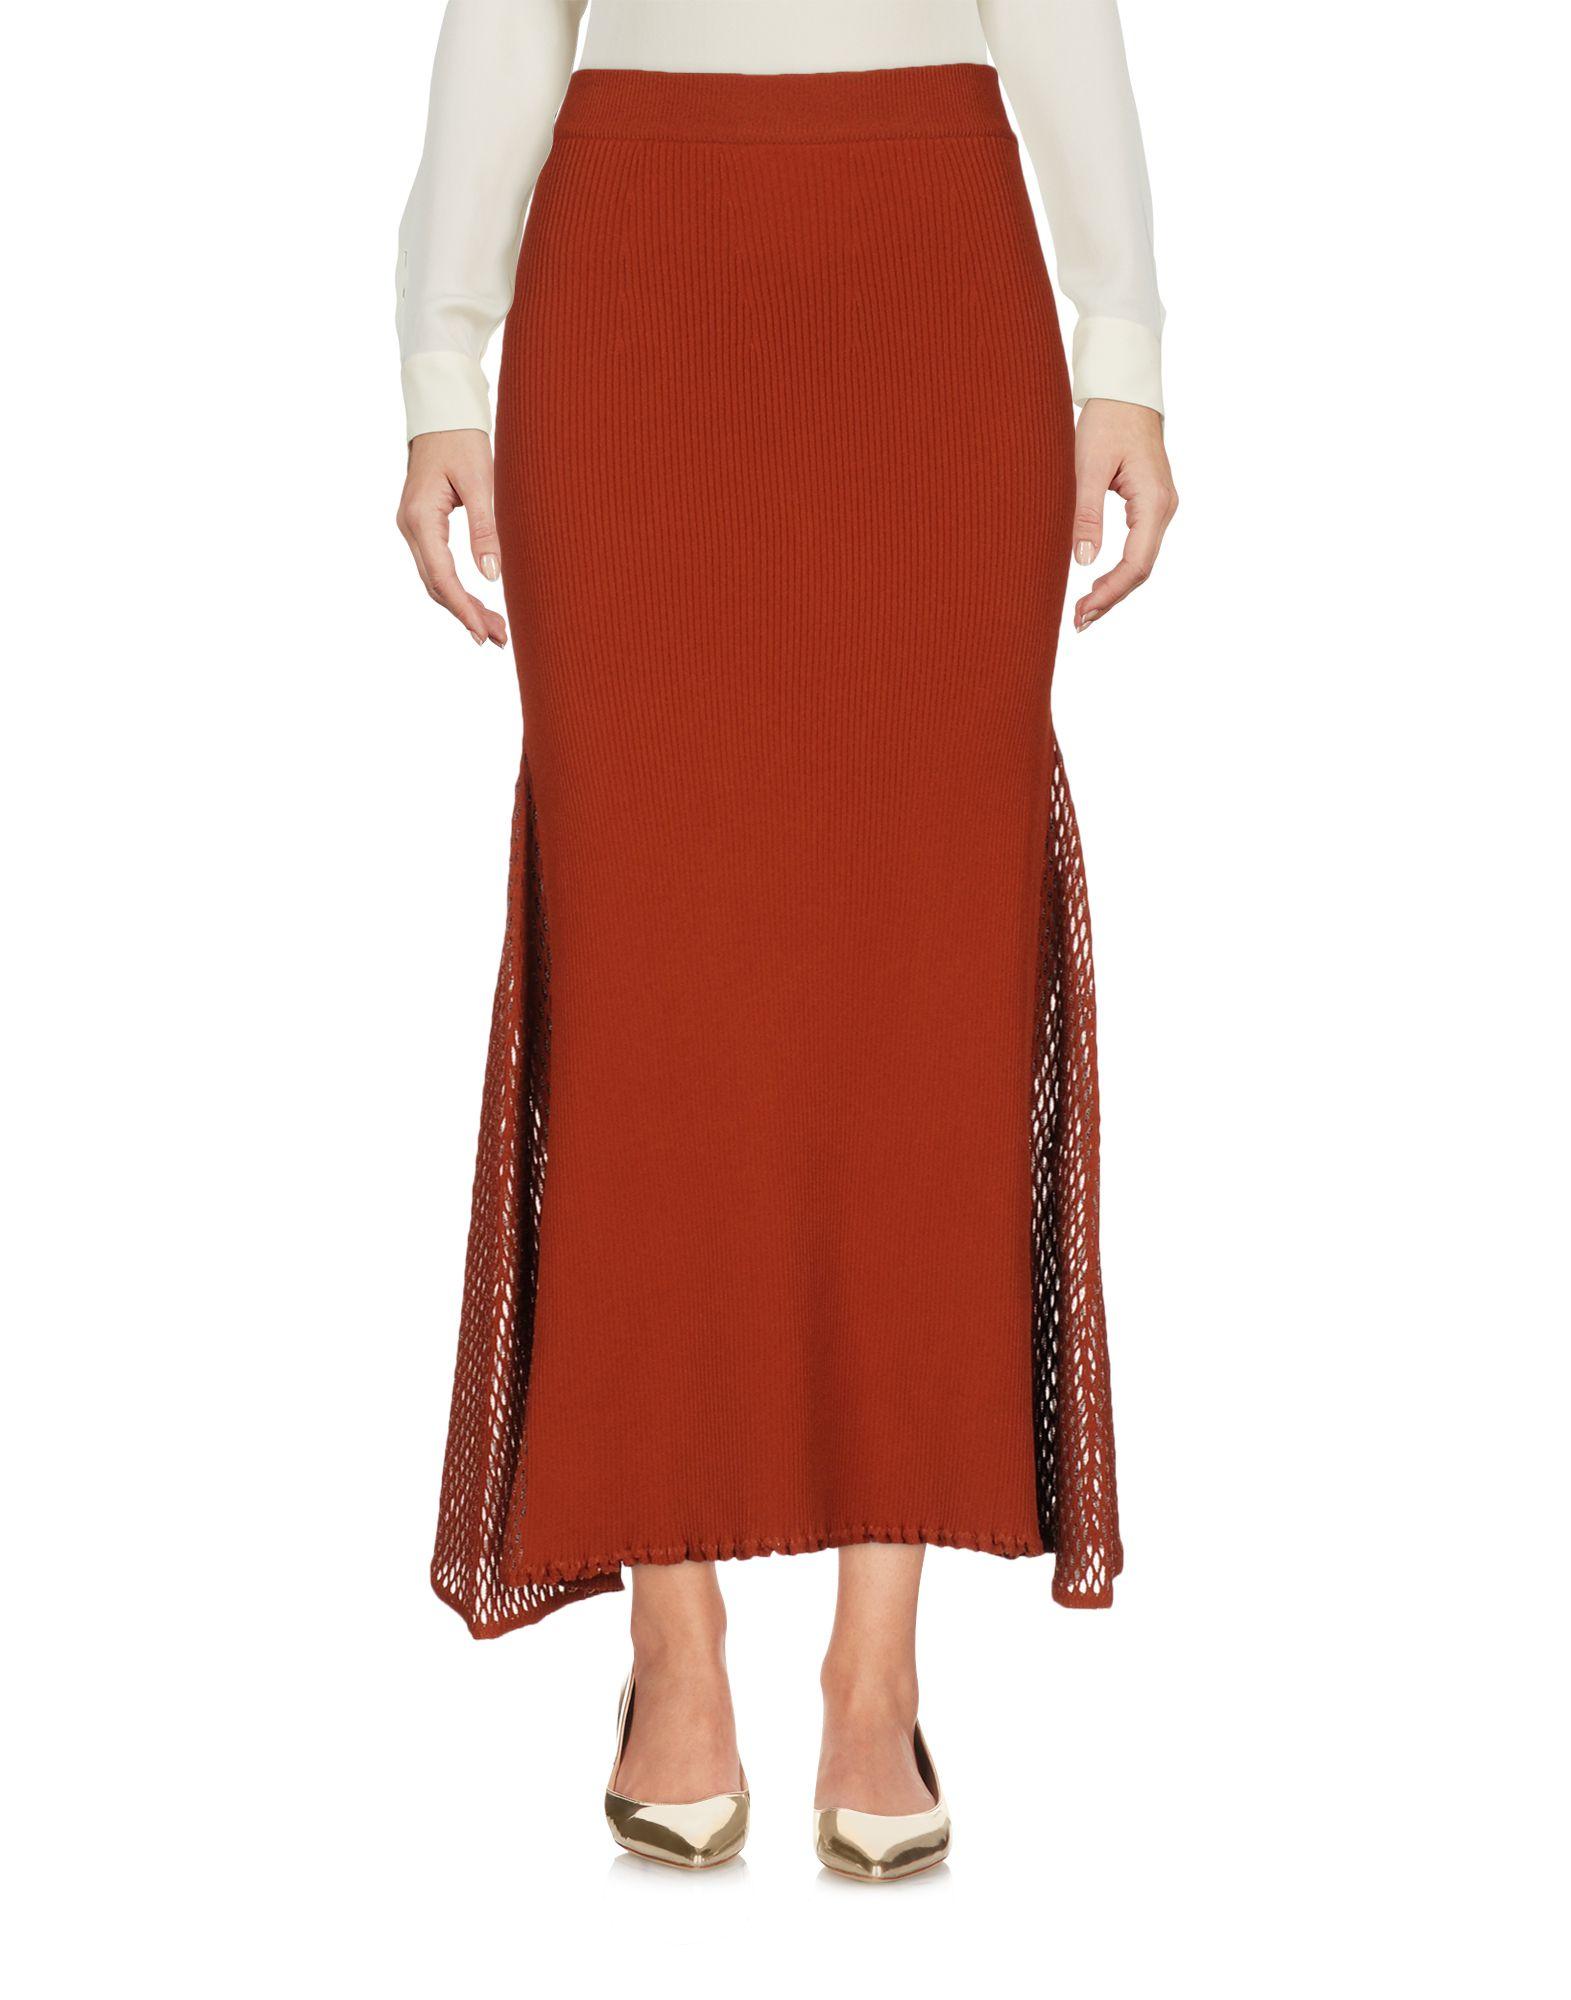 DEREK LAM Юбка длиной 3/4 moschino couture юбка длиной 3 4